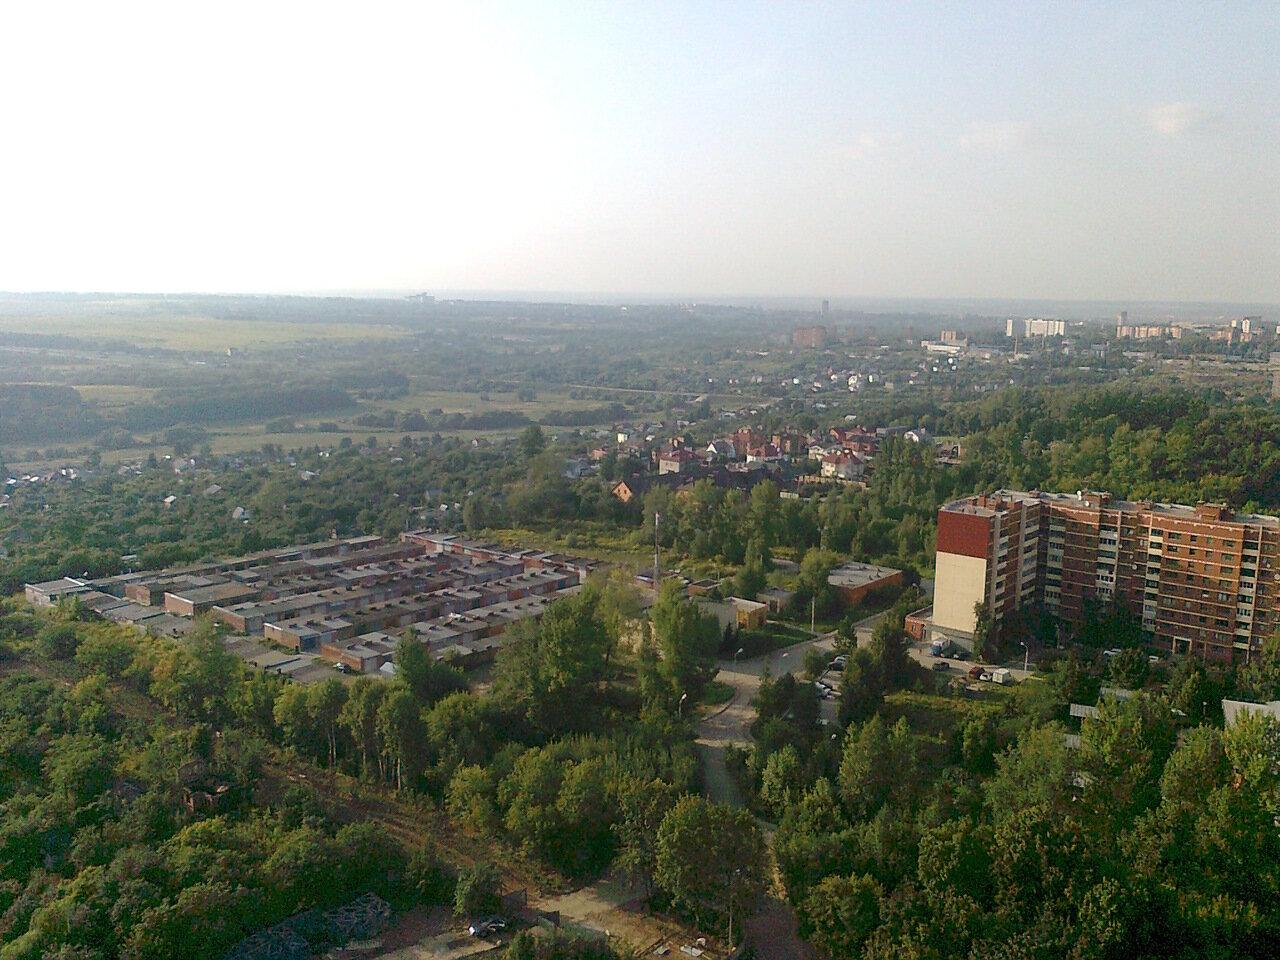 http://img-fotki.yandex.ru/get/9516/162482795.4/0_bc73b_979ed48a_XXXL.jpg